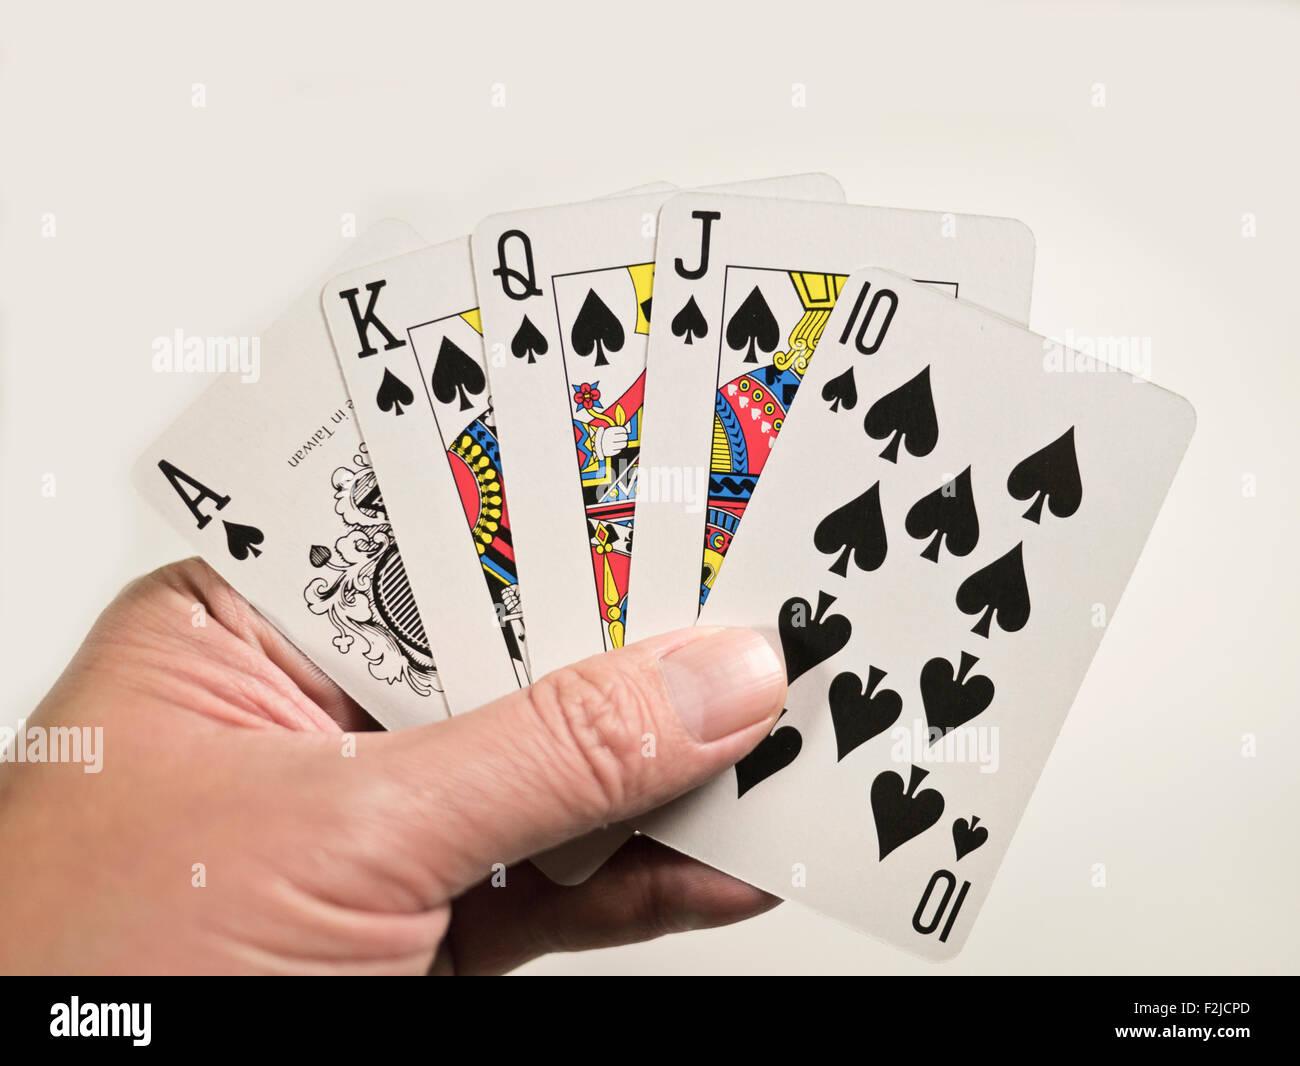 Poker 4 of a kind vs straight flush